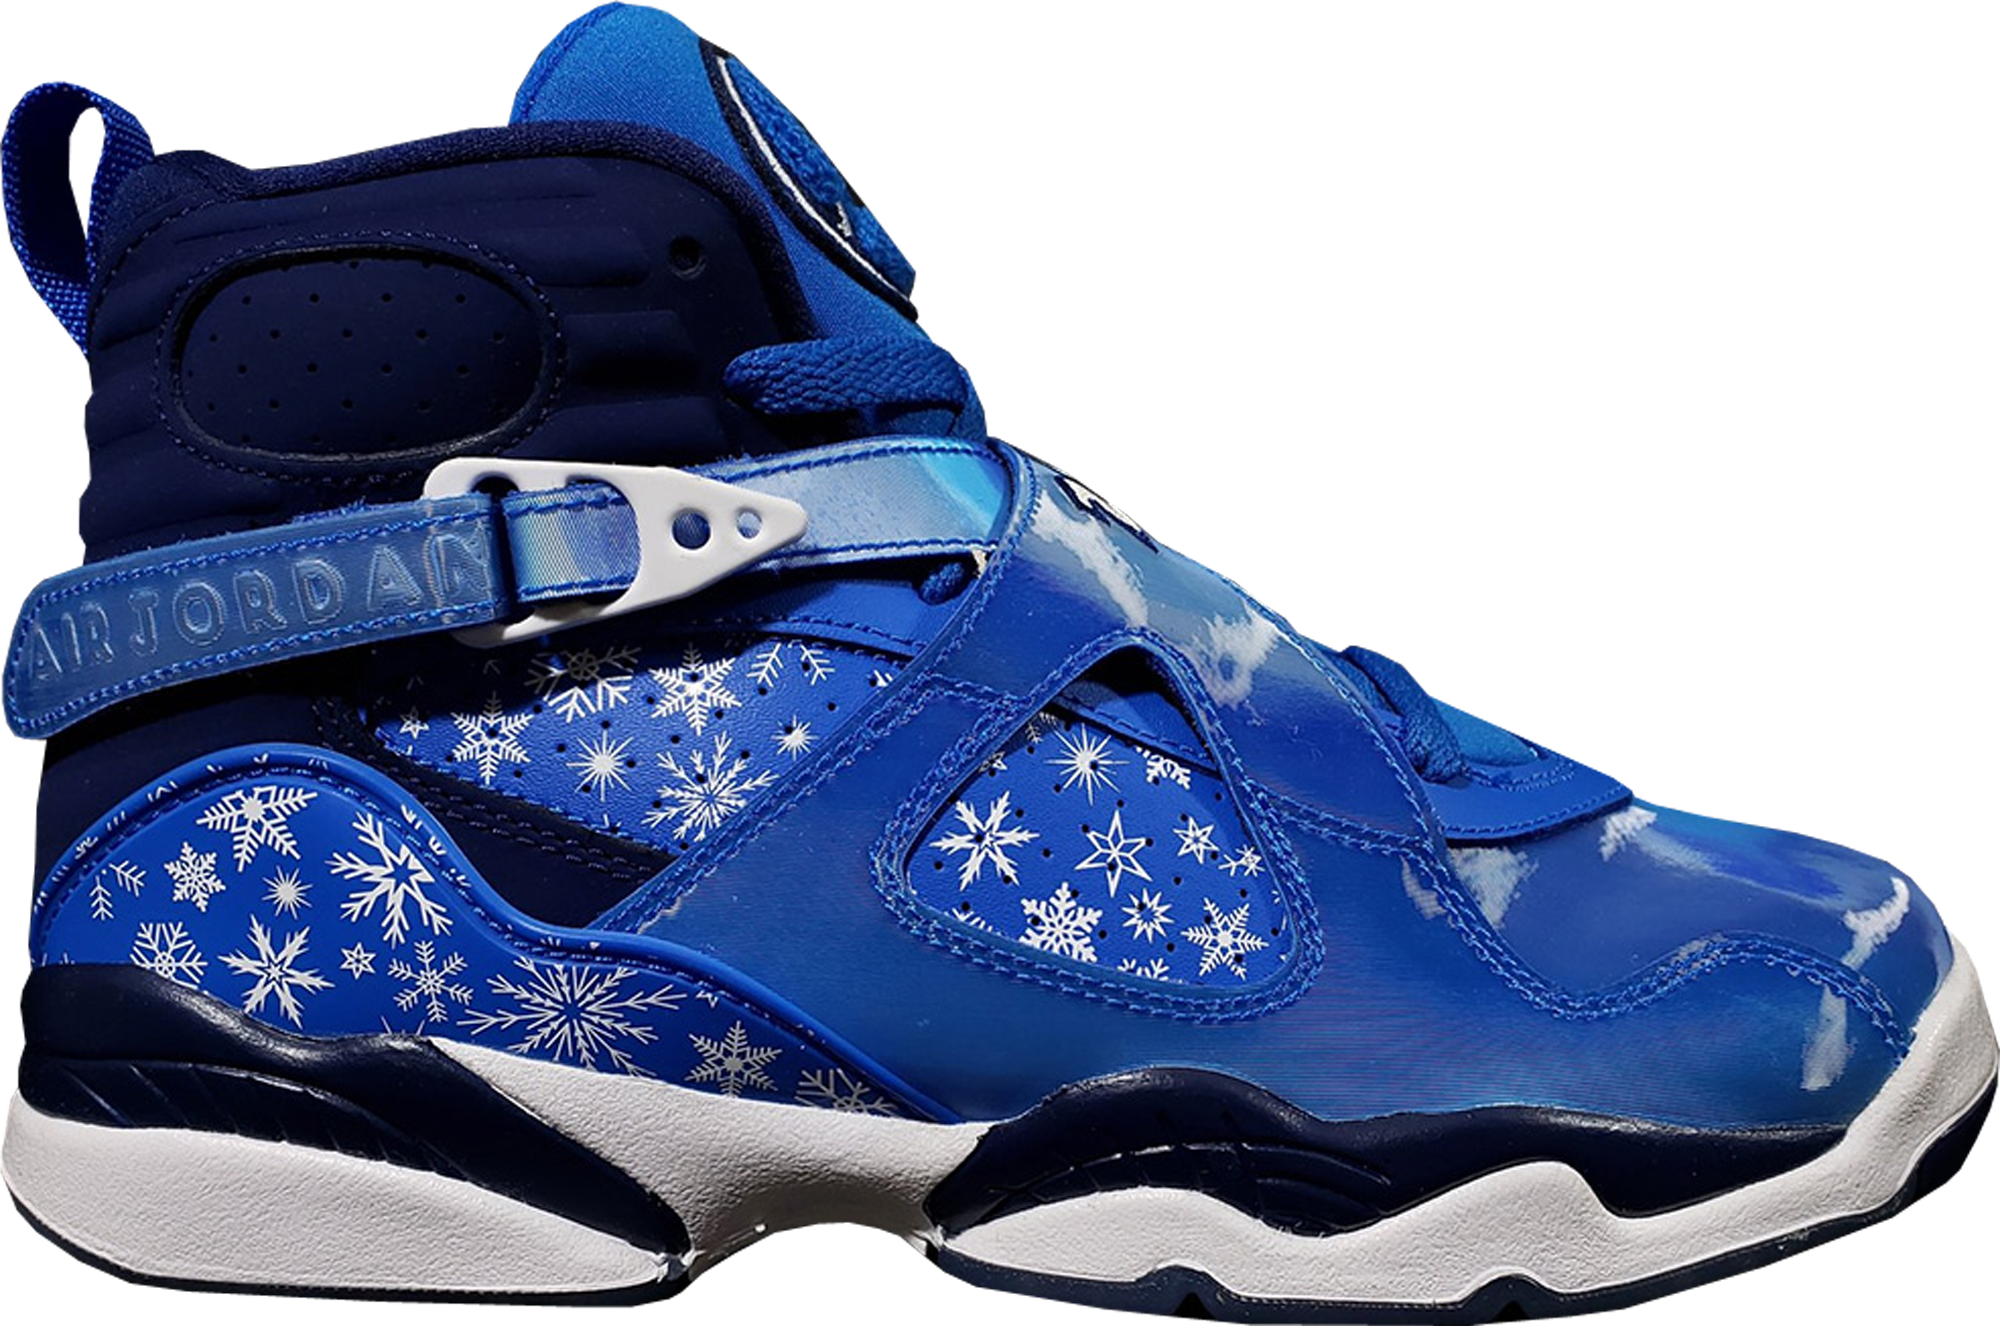 Jordan 8 Retro Snow Blizzard (GS